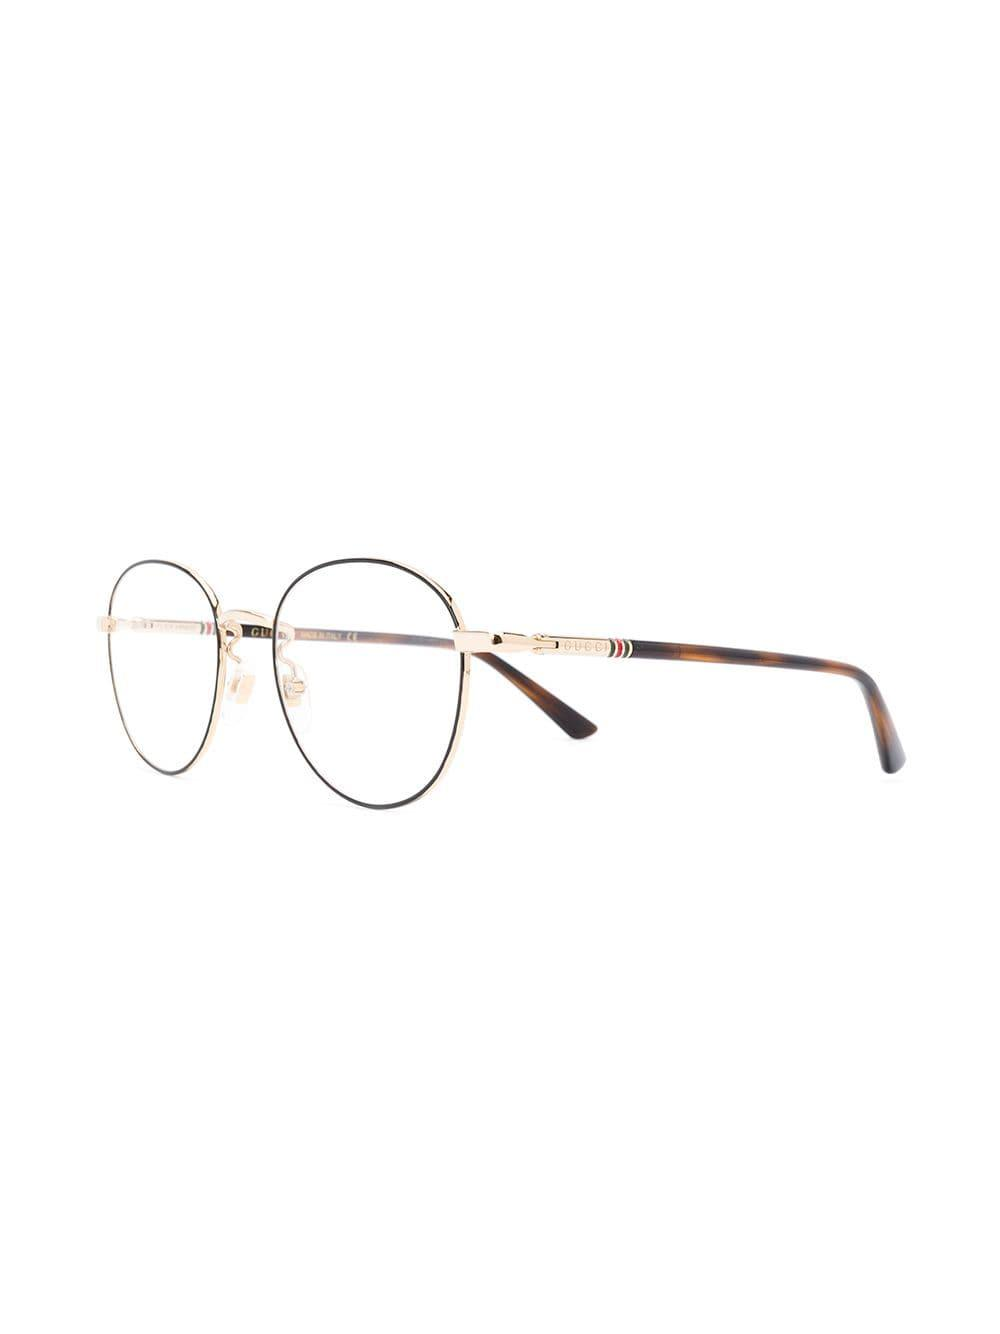 dd3da48721 Gucci - Black Round Glasses for Men - Lyst. View fullscreen